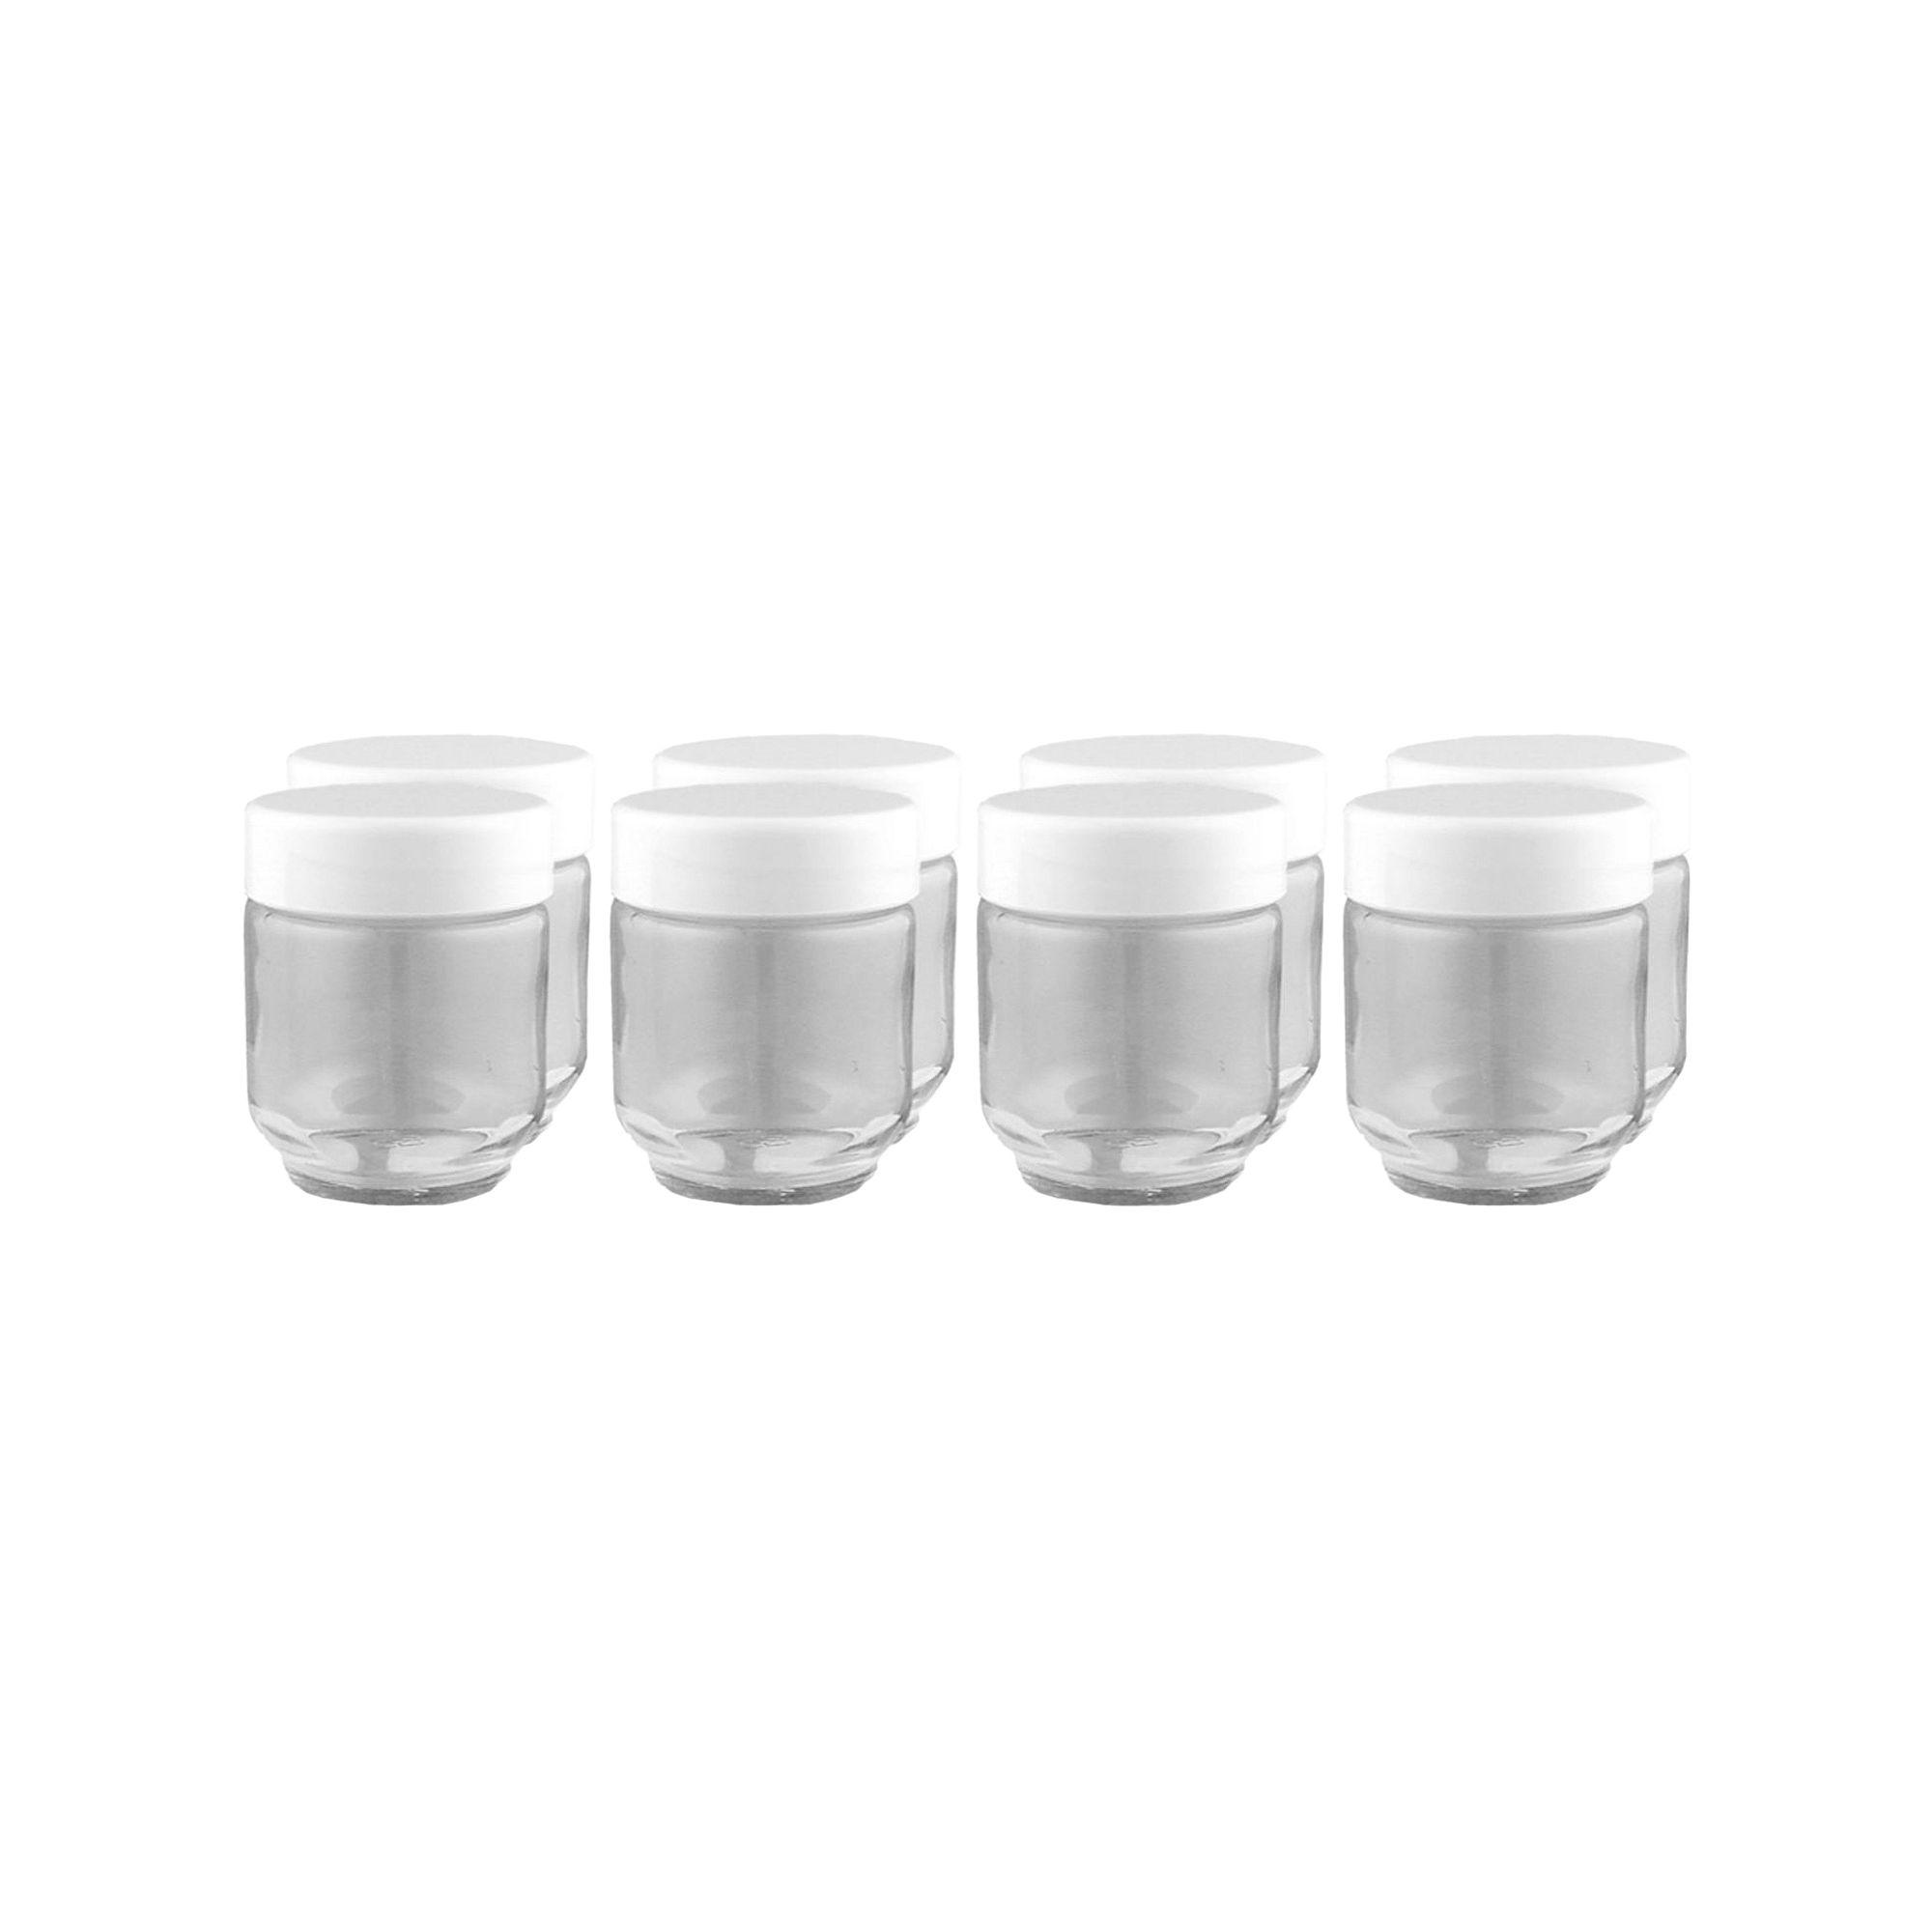 Euro-Cuisine Set of 8 Glass Jars + Lids GY1920